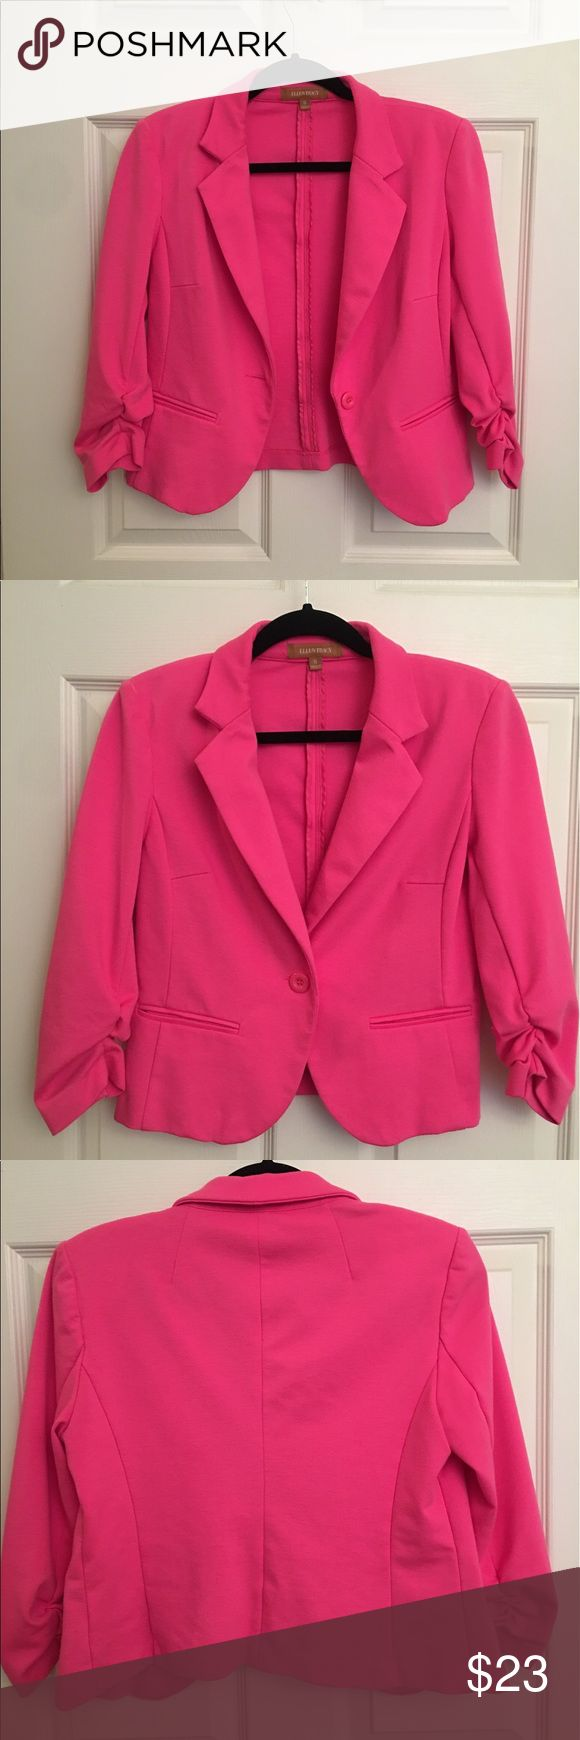 Hot pink blazer Hot pink Ellen Tracy blazer Ellen Tracy Jackets & Coats Blazers